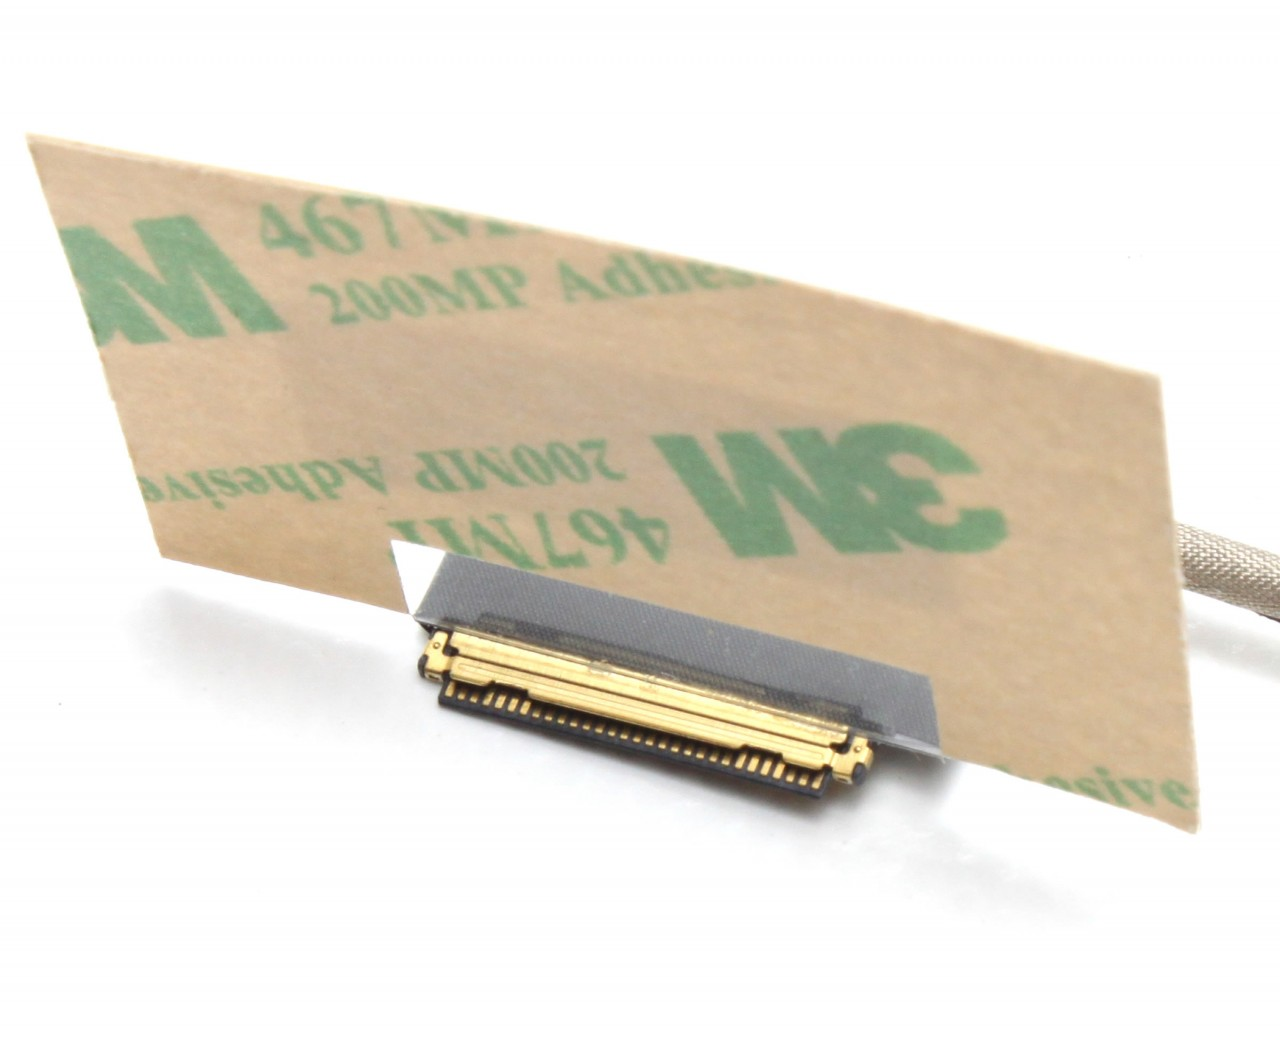 Cablu video Edp Lenovo IdeaPad 320S-15 imagine powerlaptop.ro 2021